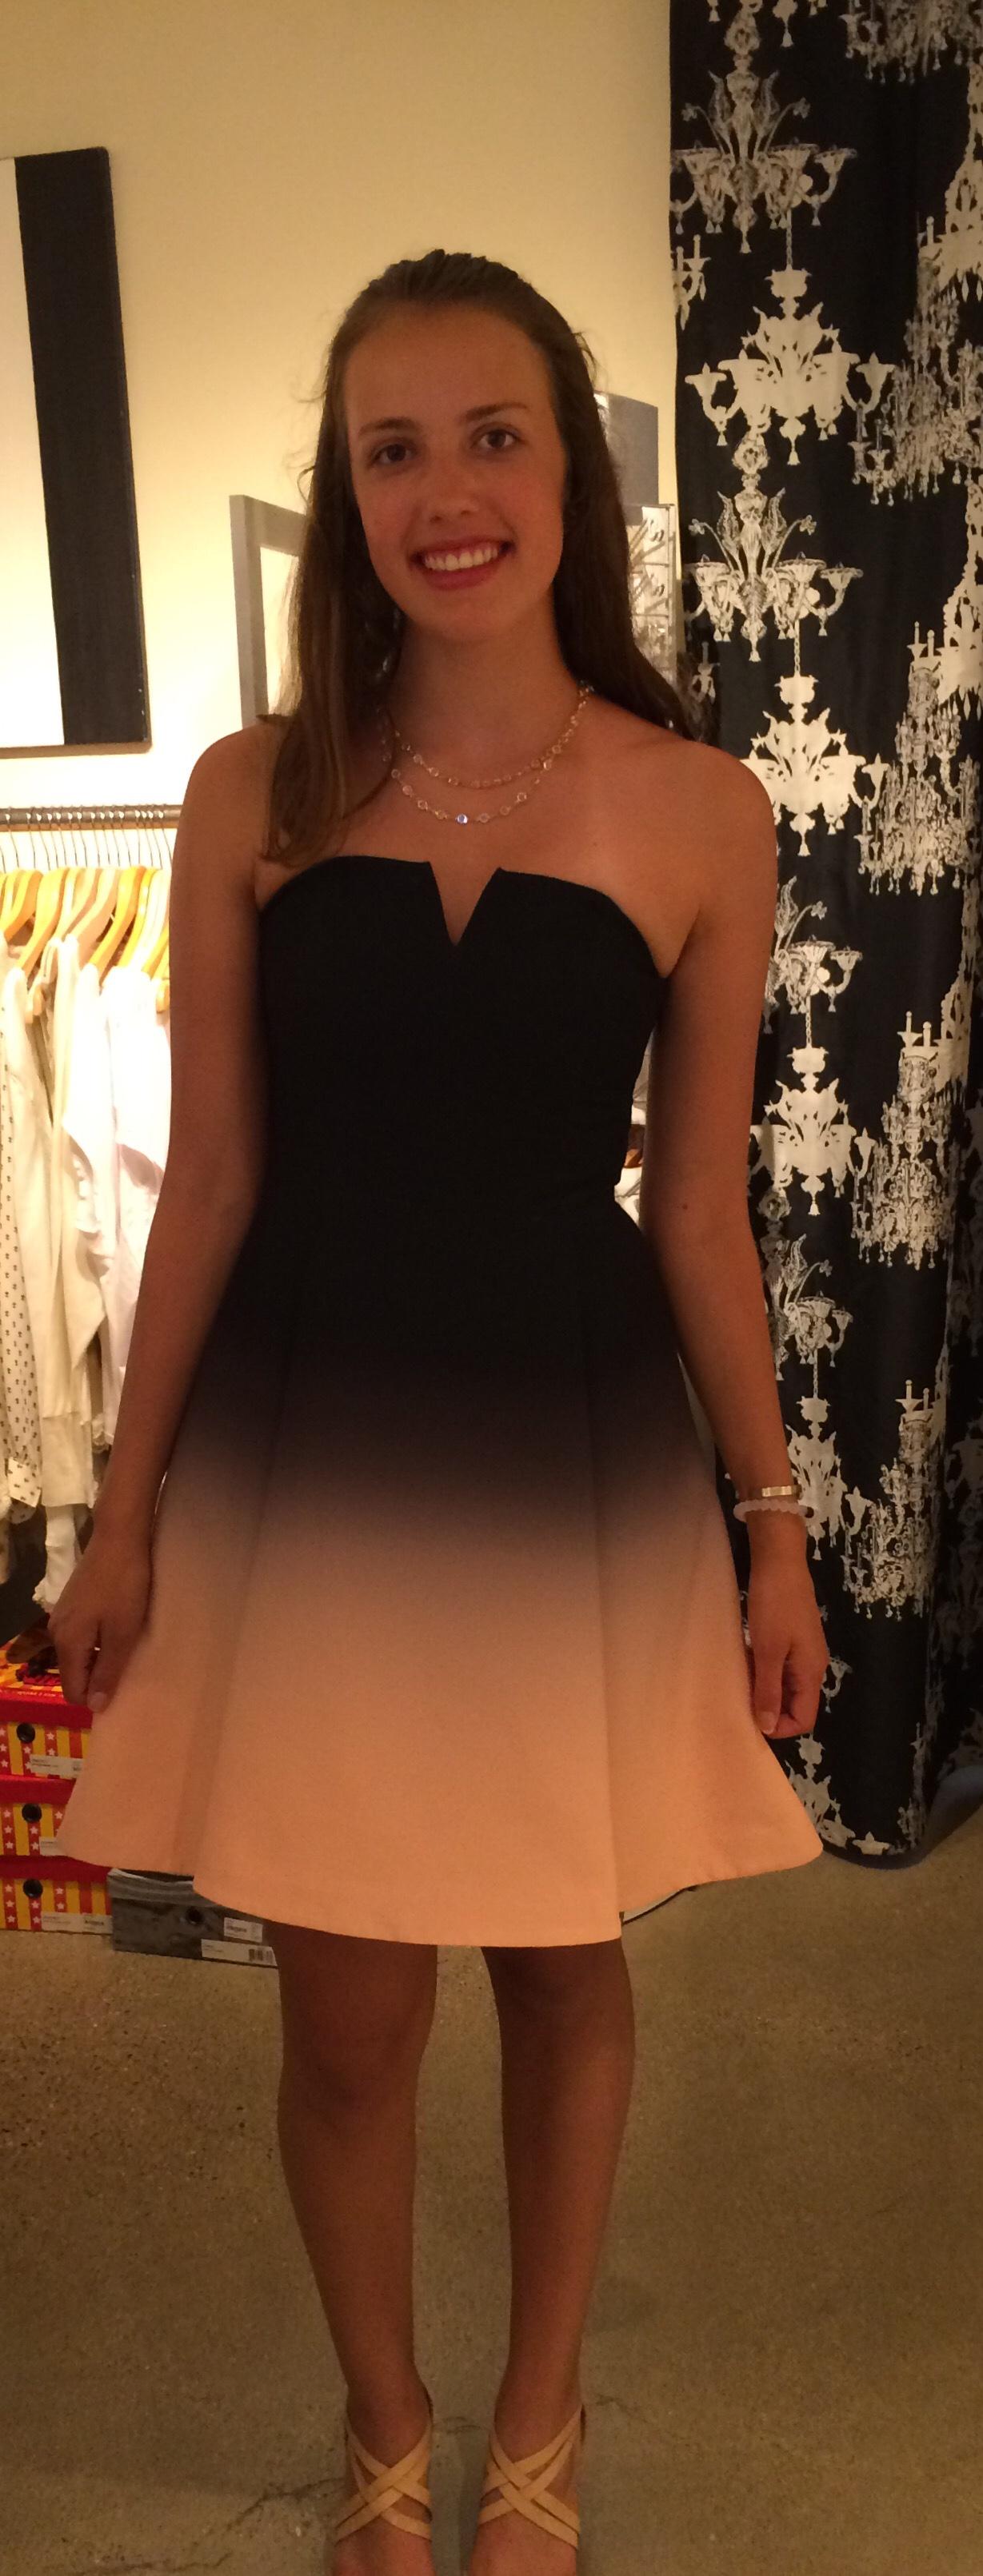 Here's the dress when I originally tried it on in San Louis Obispo, California. Halston Heritage, $445.00